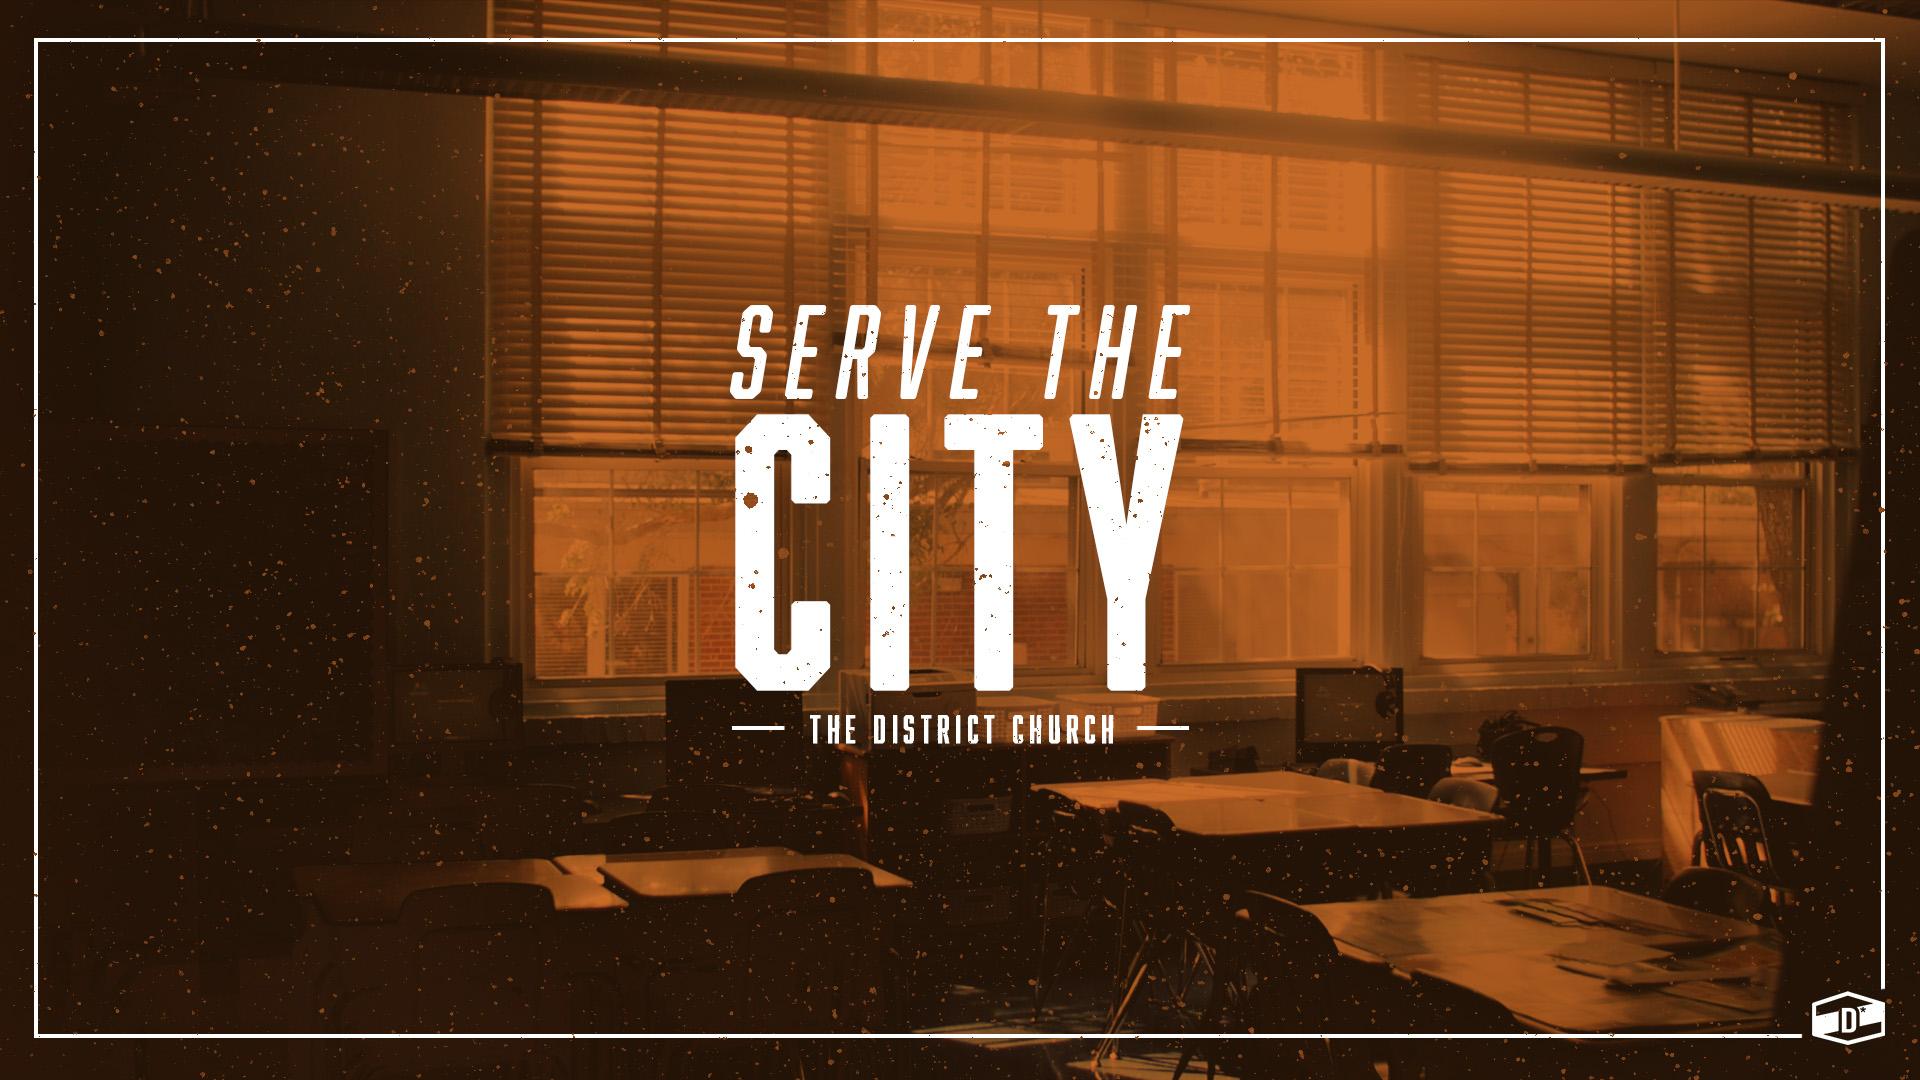 Serve the city_WEB.jpg